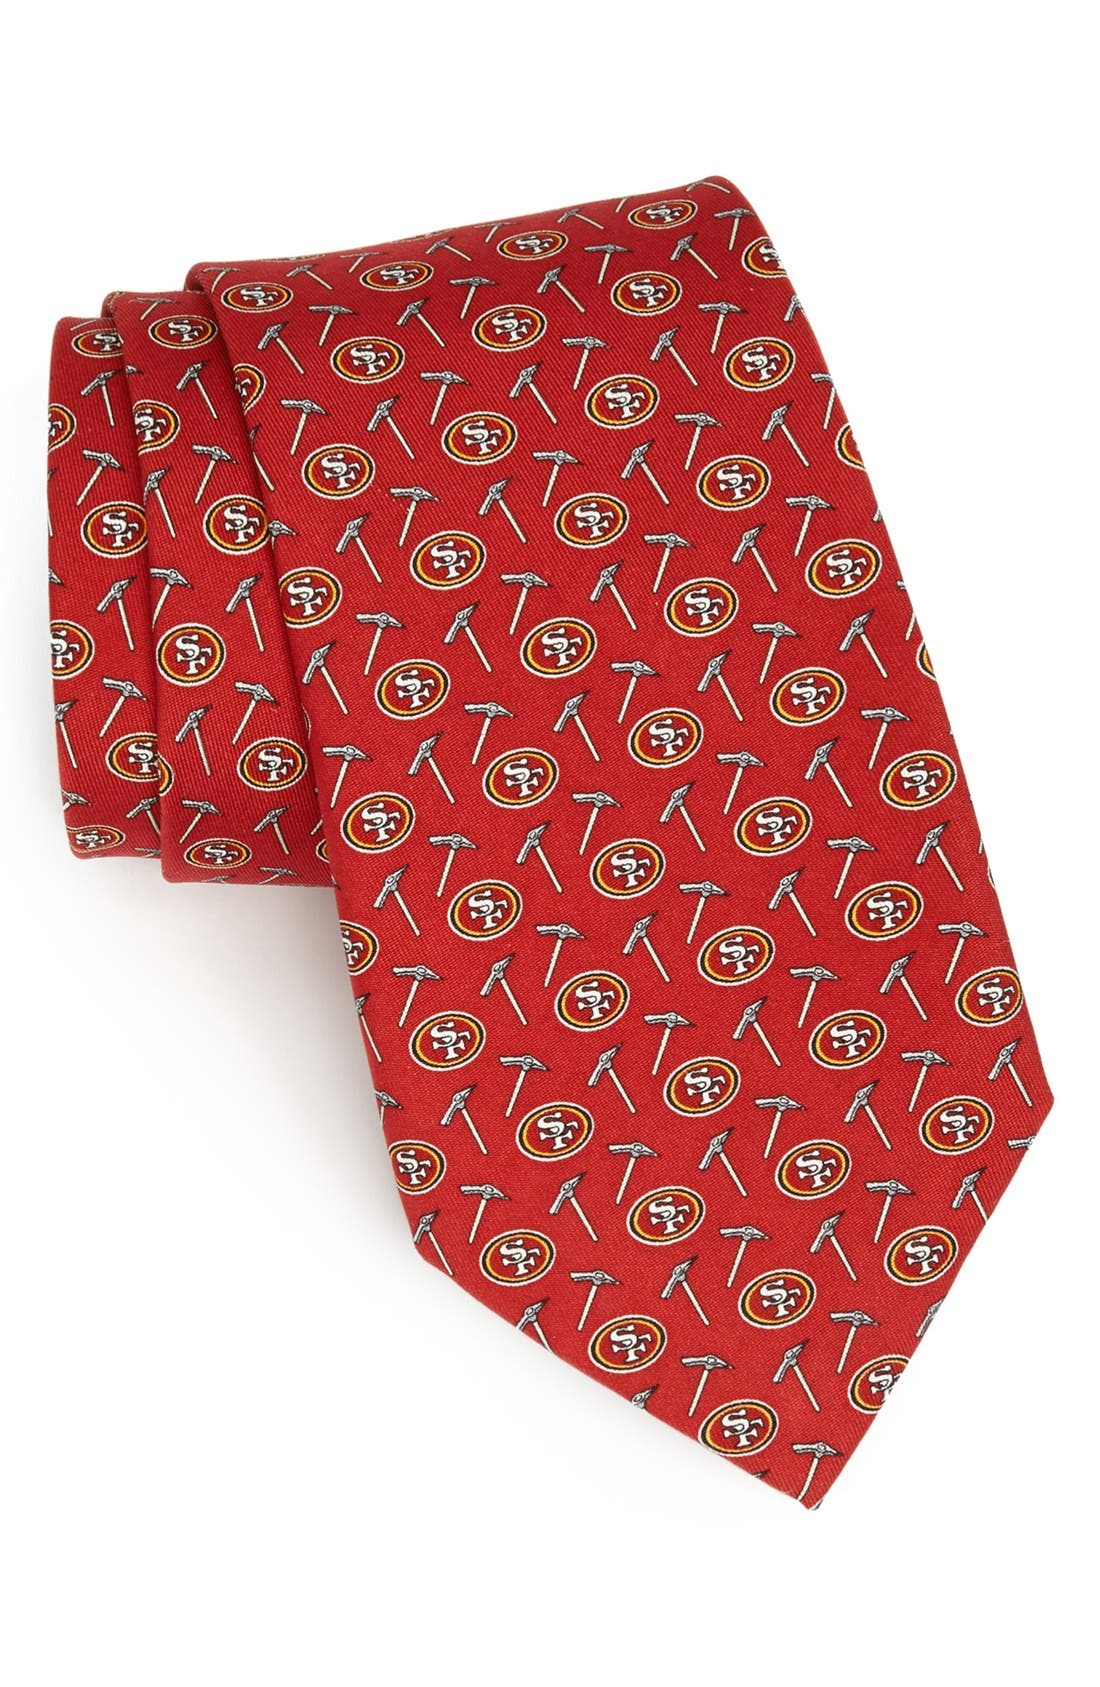 VINEYARD VINES San Francisco 49ers Print Tie, Main, color, RED